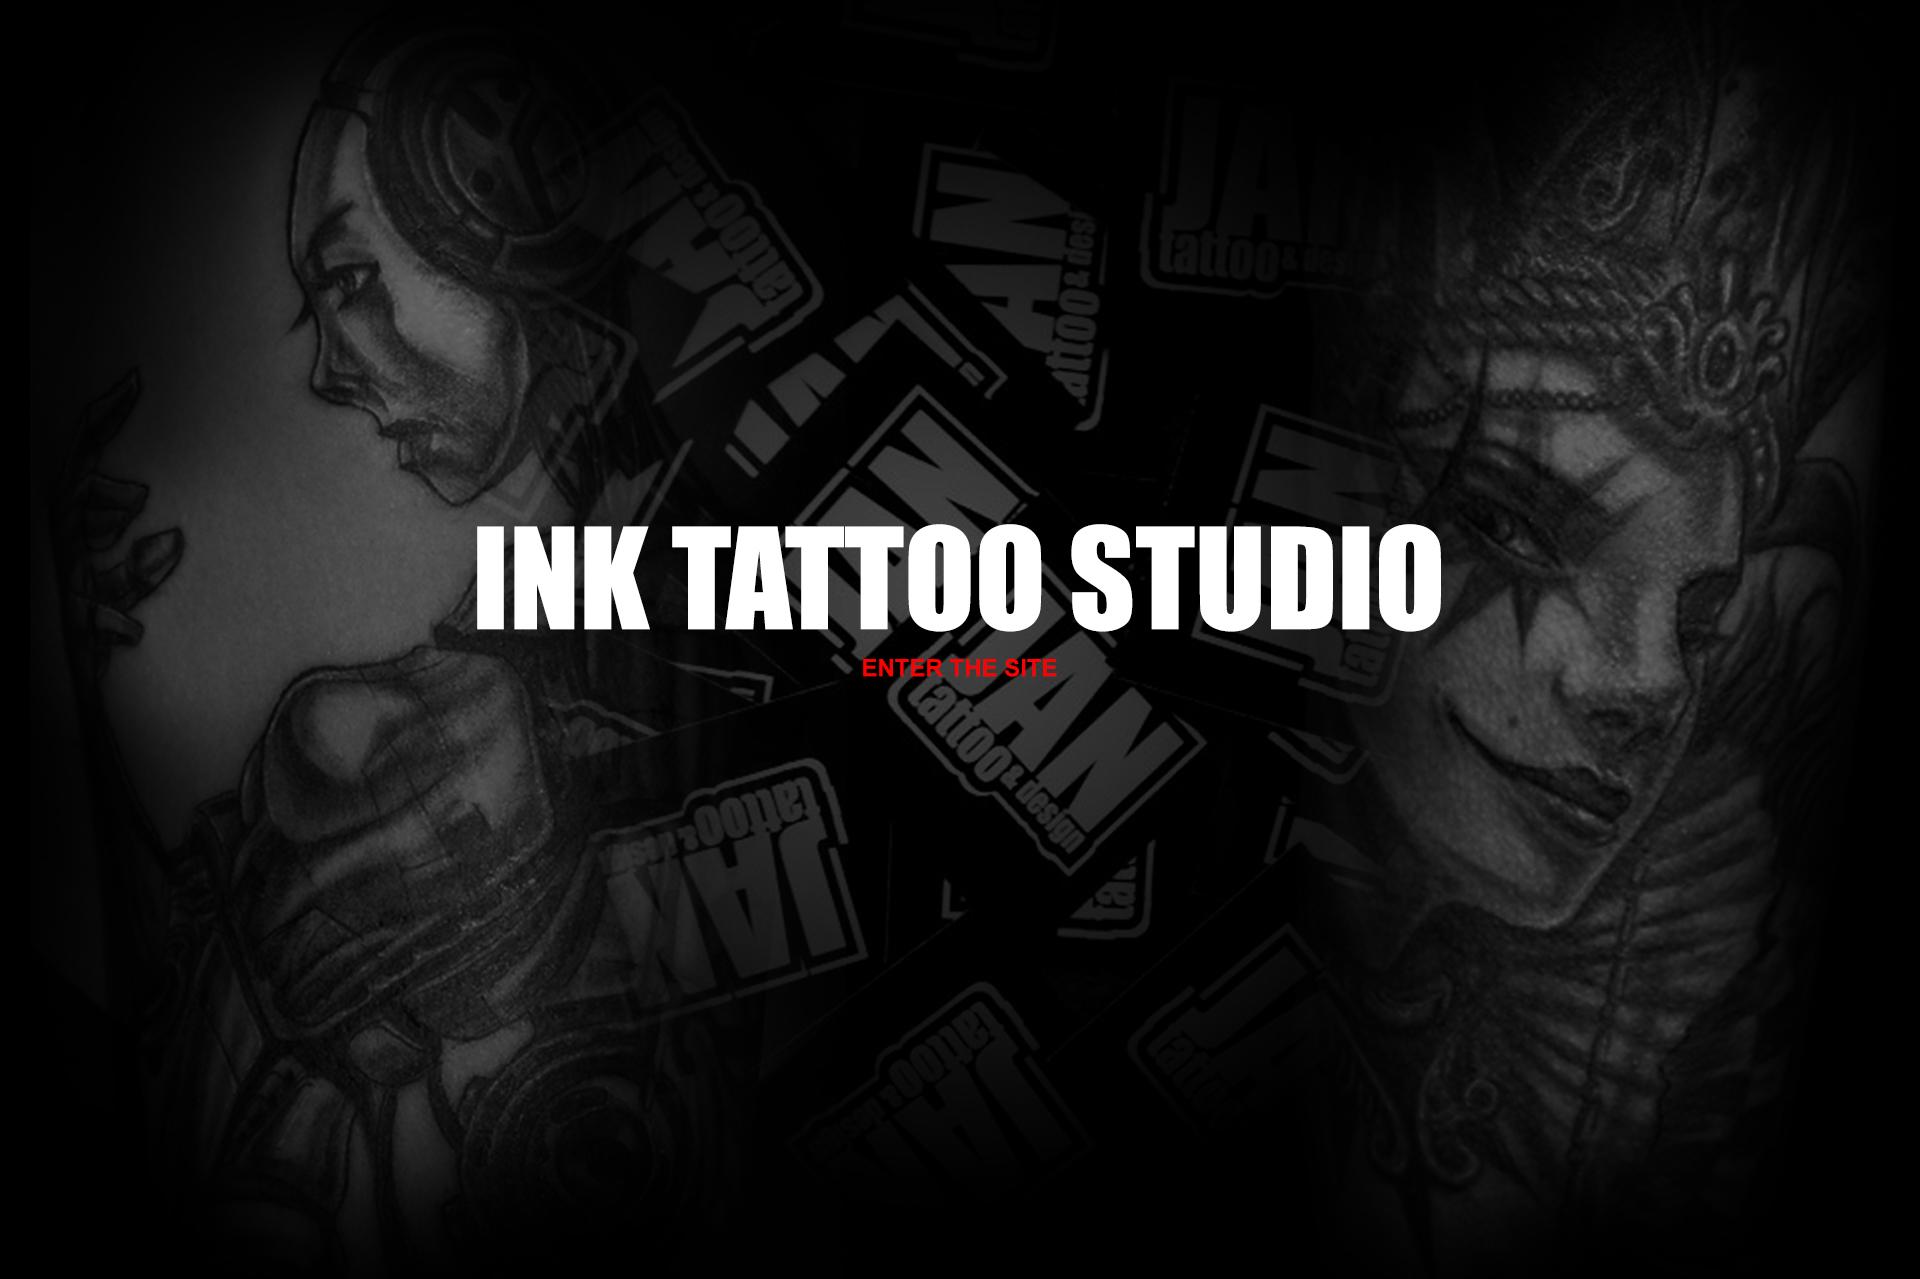 ink tattoo studio. Black Bedroom Furniture Sets. Home Design Ideas